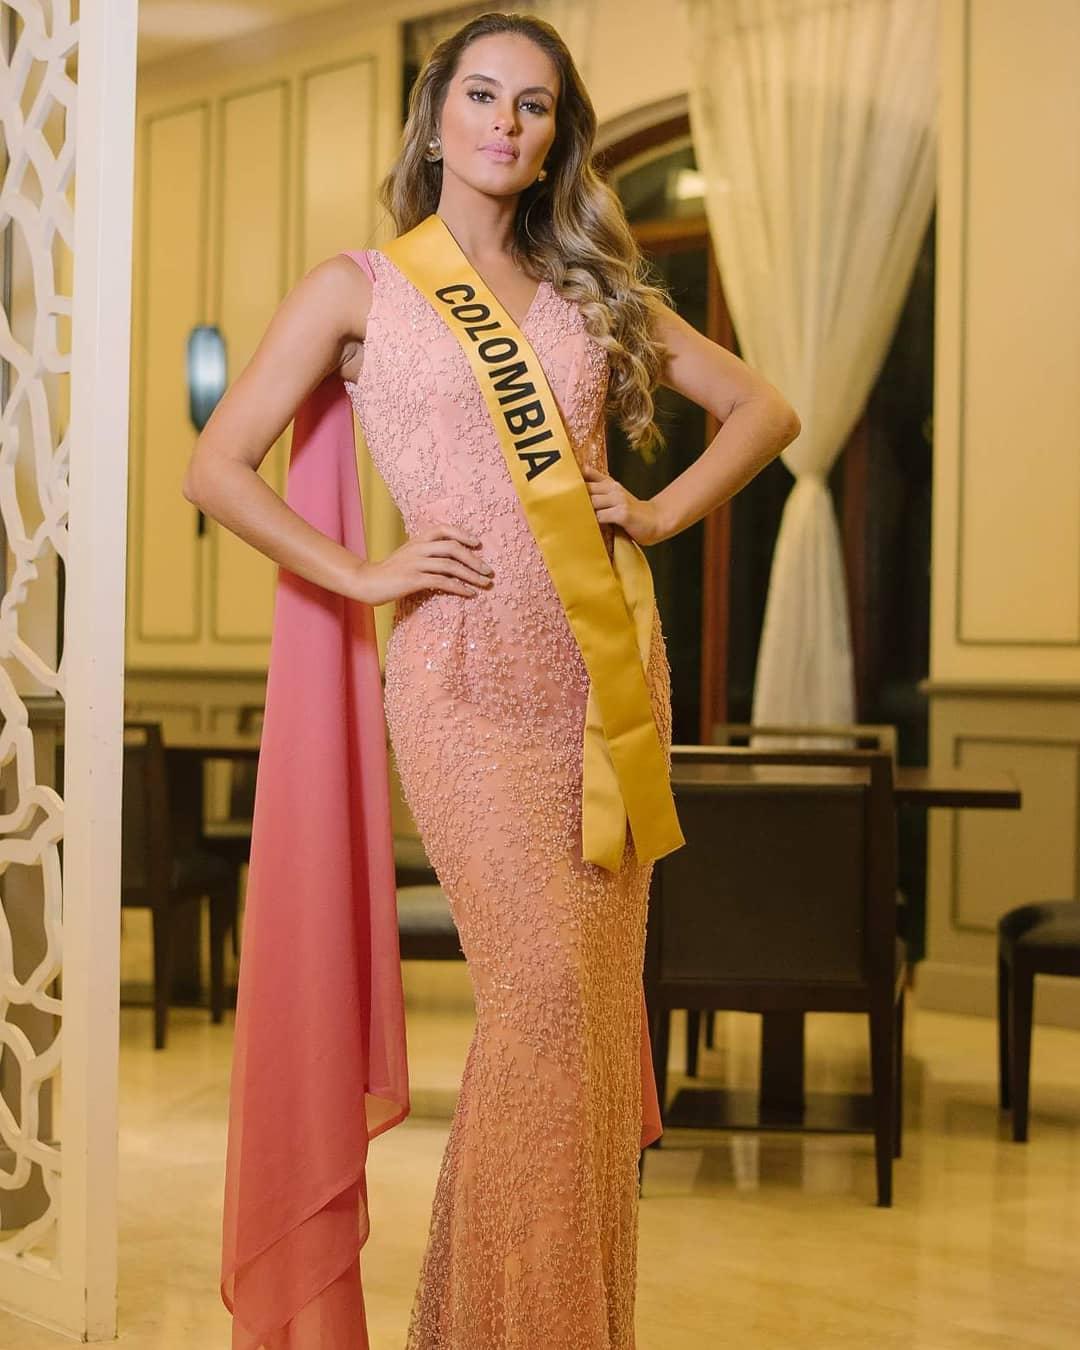 sheyla quizena, miss grand colombia 2018. - Página 3 42141212